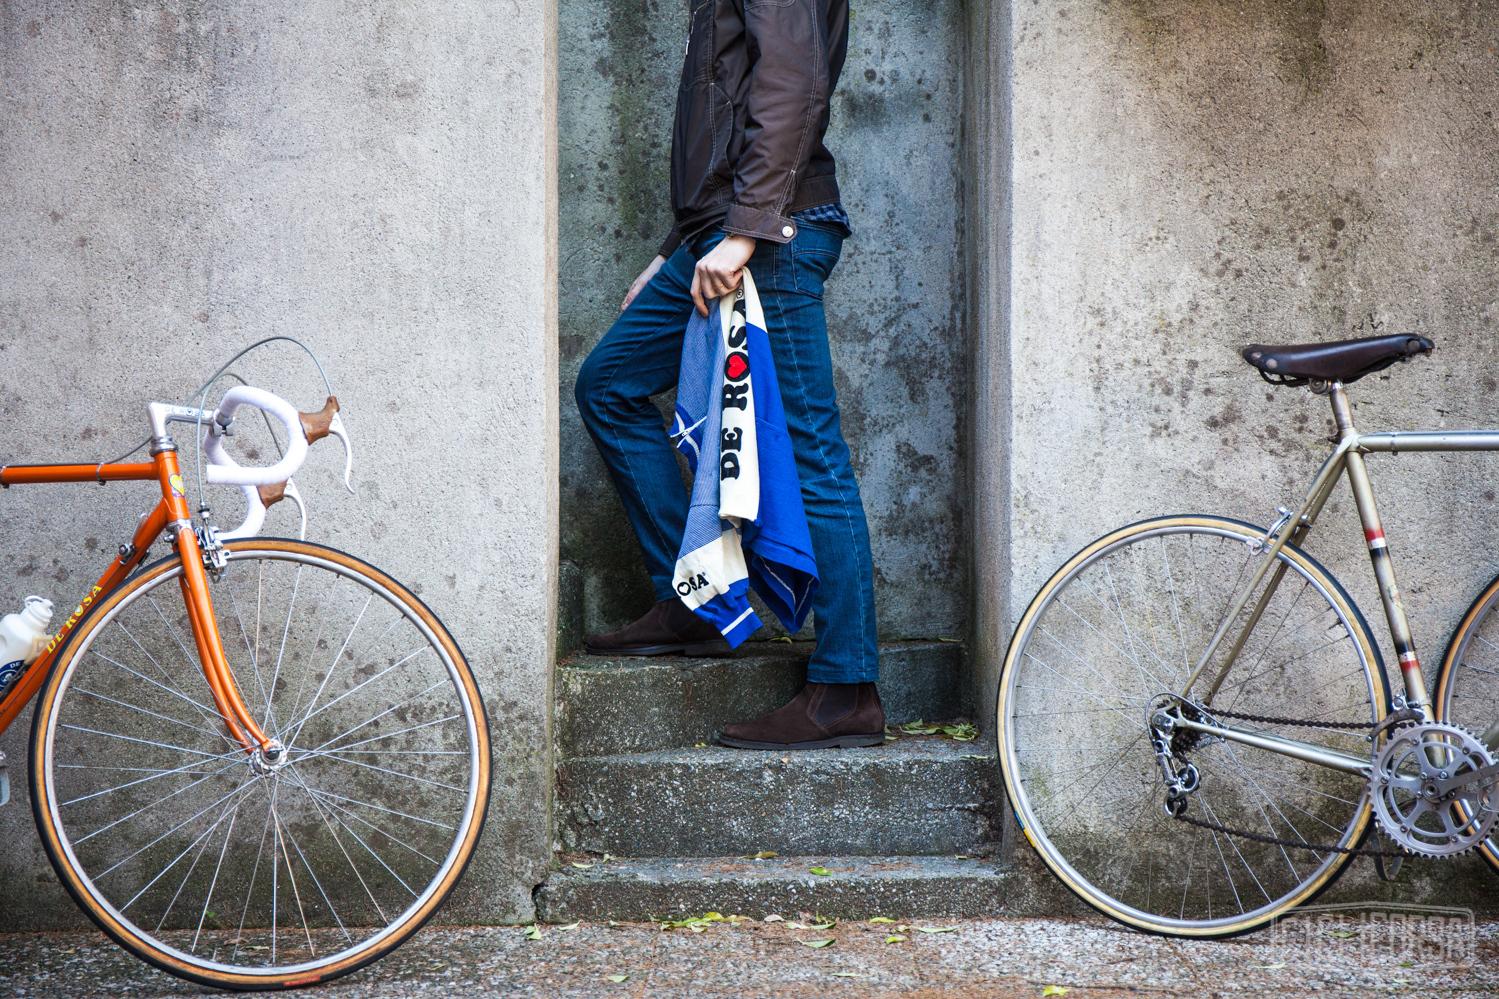 The Bicicletalist De Rosa Bicycle Collection